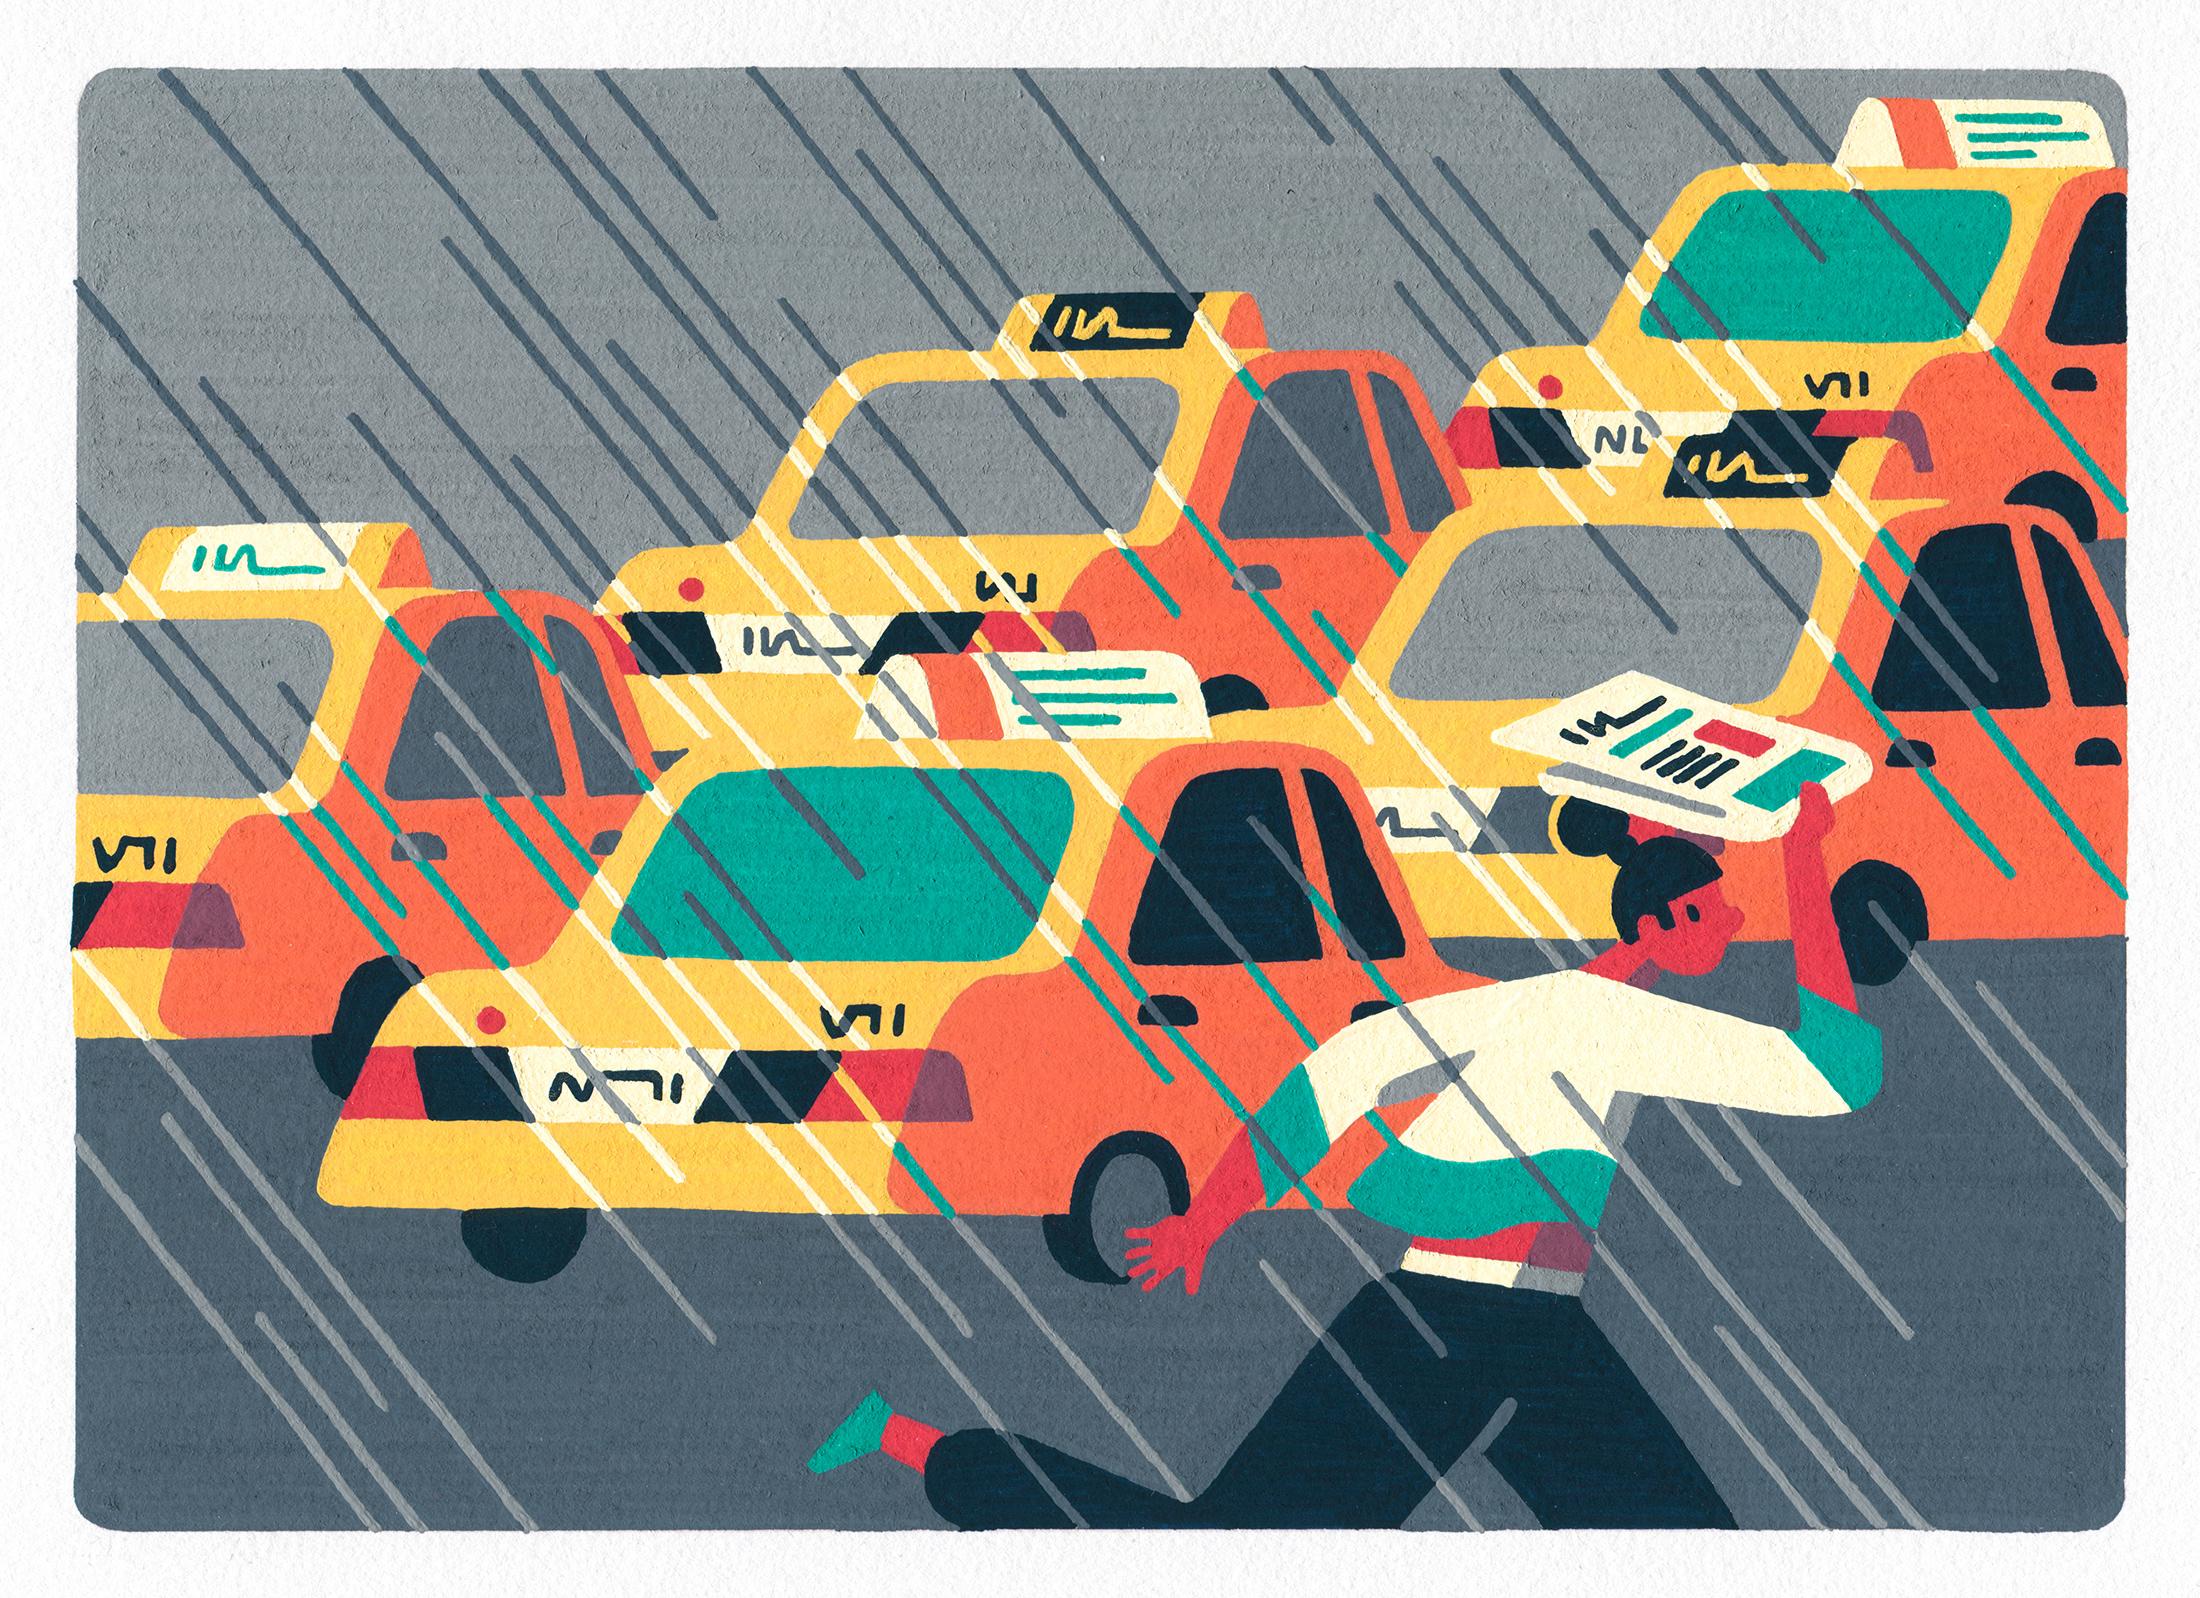 Illustration by Priya Mistry using Posca markers